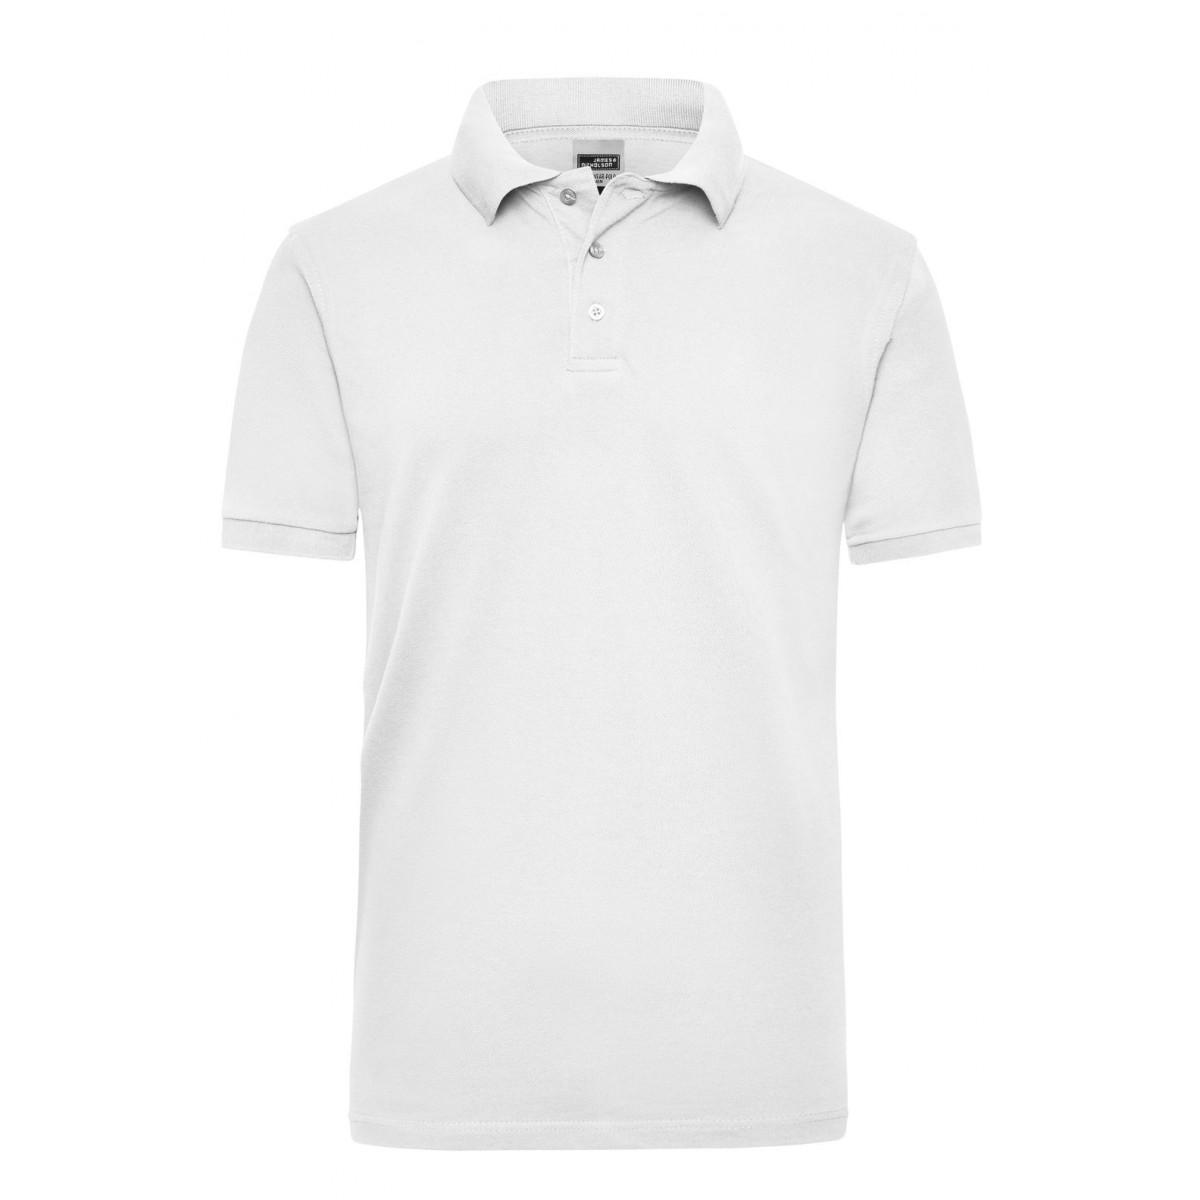 Рубашка поло мужская JN801 Workwear Polo Men - Белый